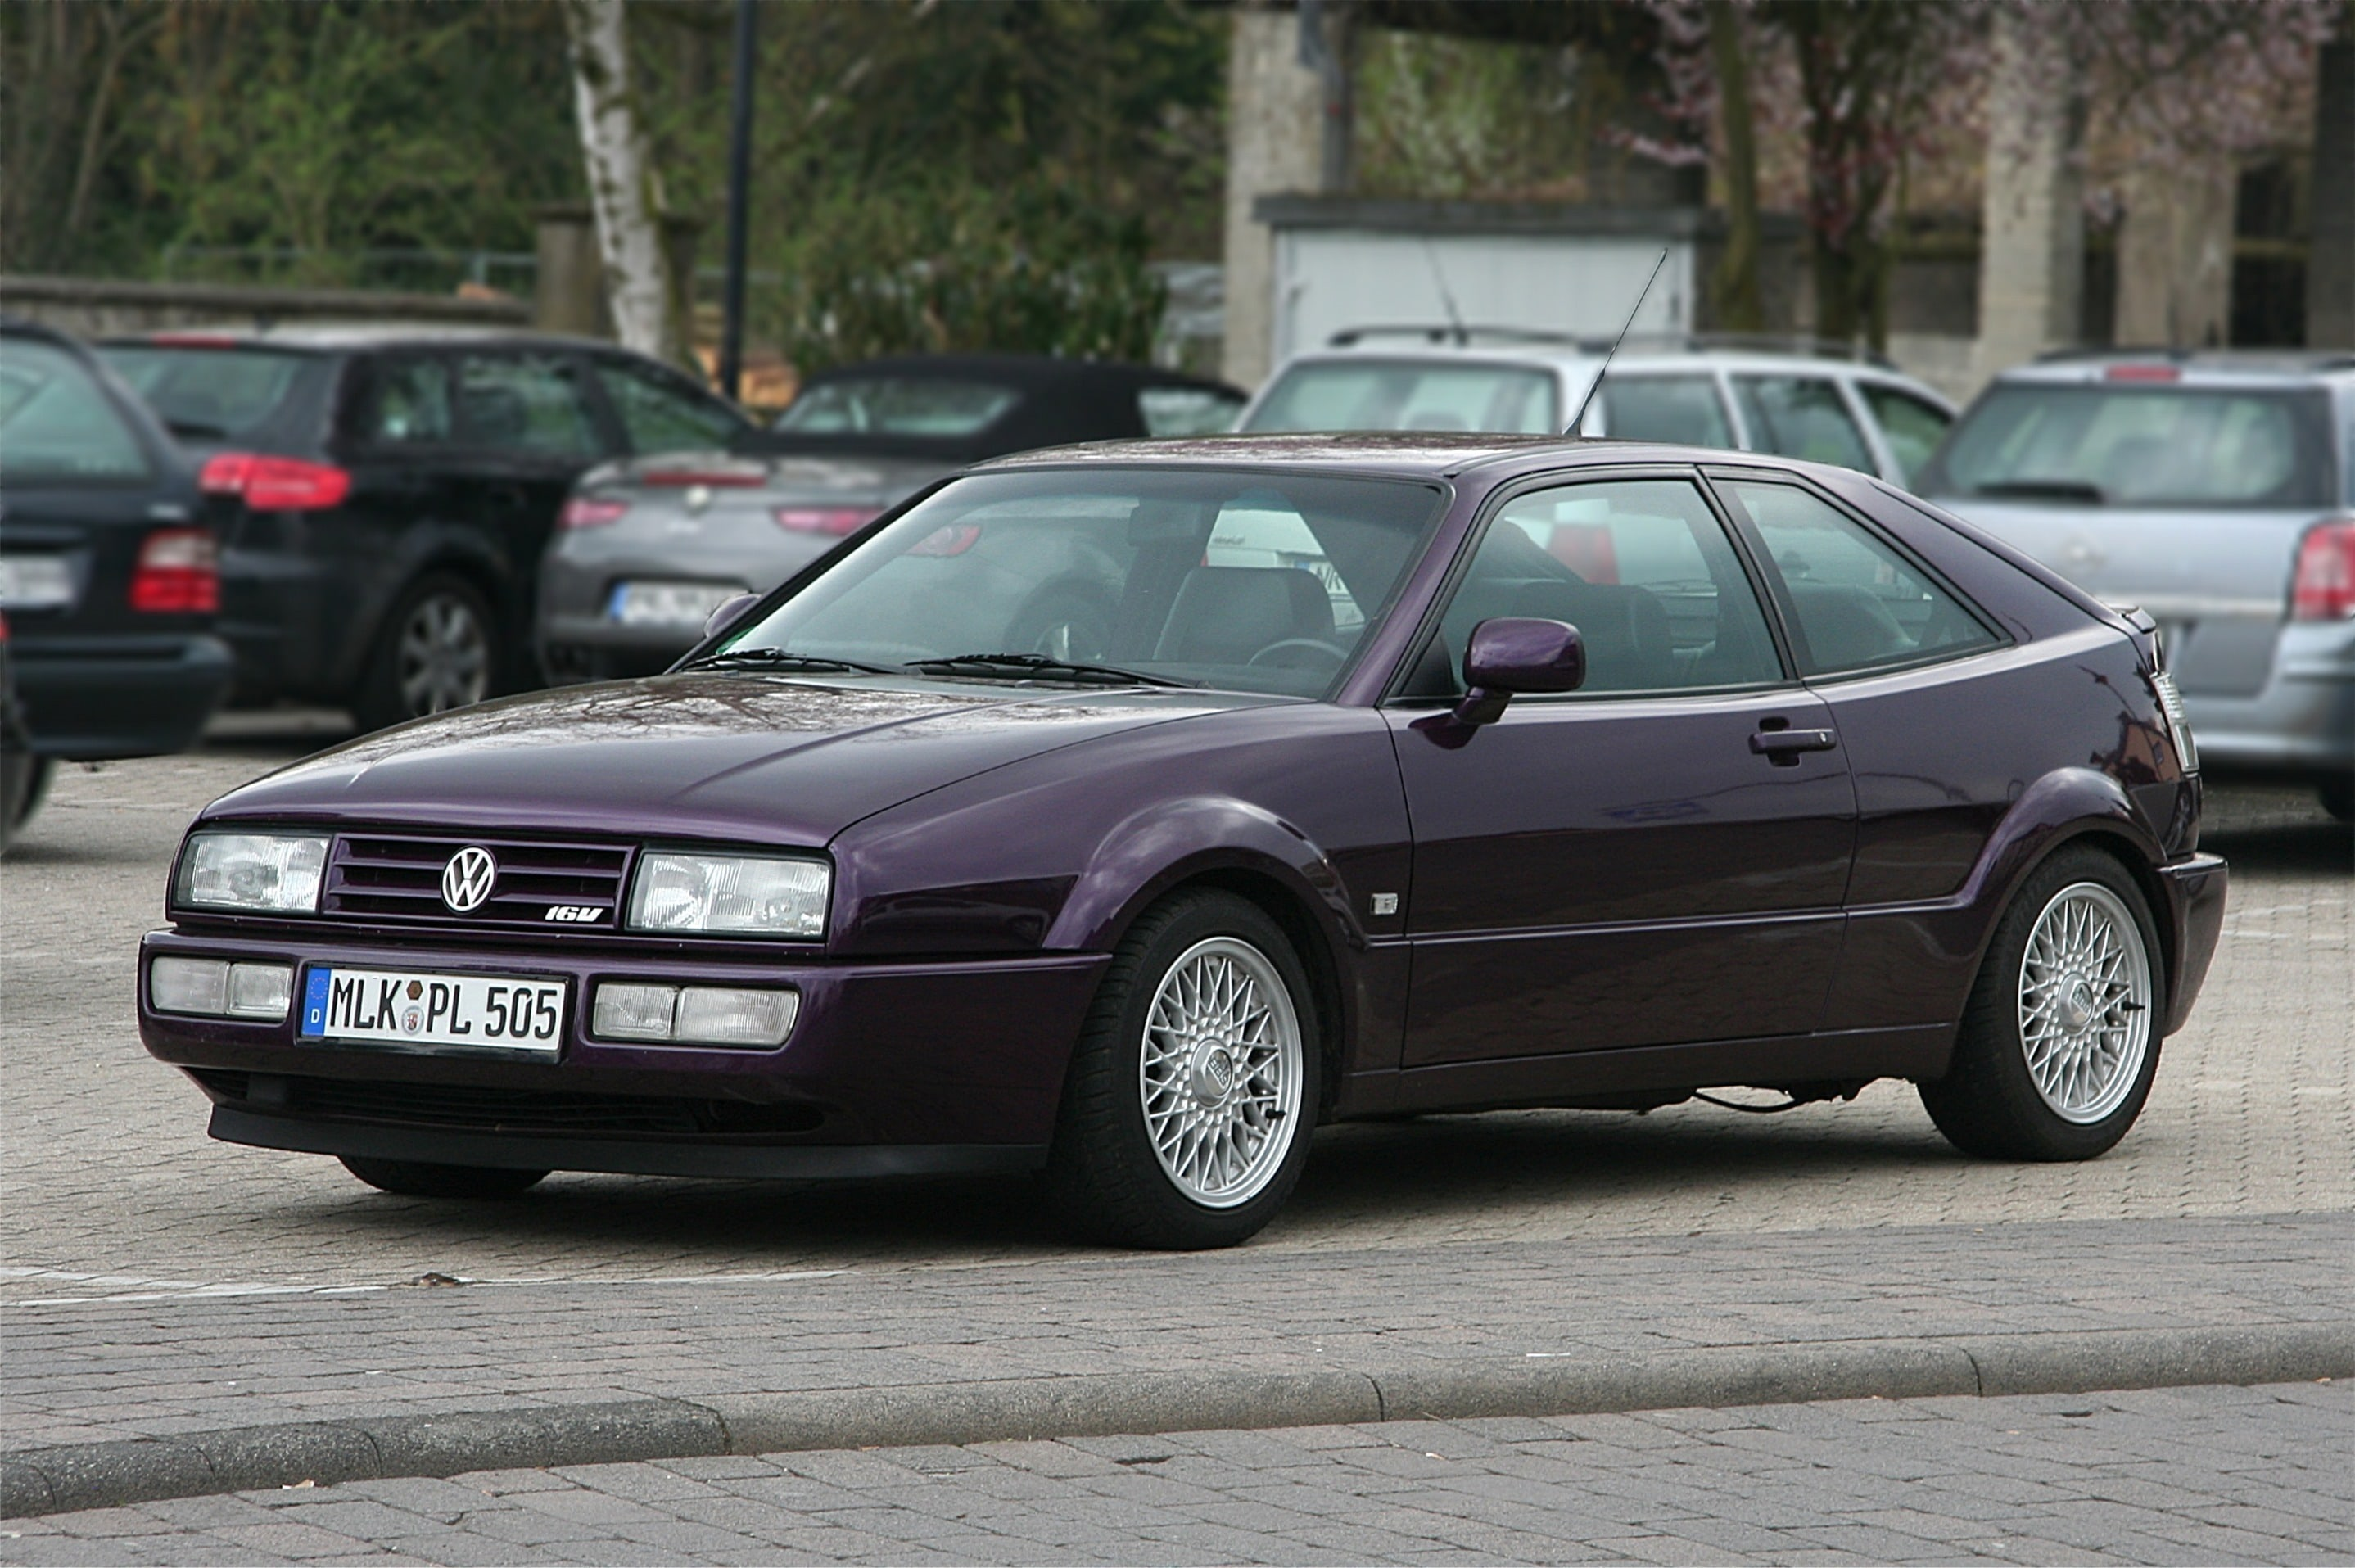 Volkswagen Corrado Wallpaper